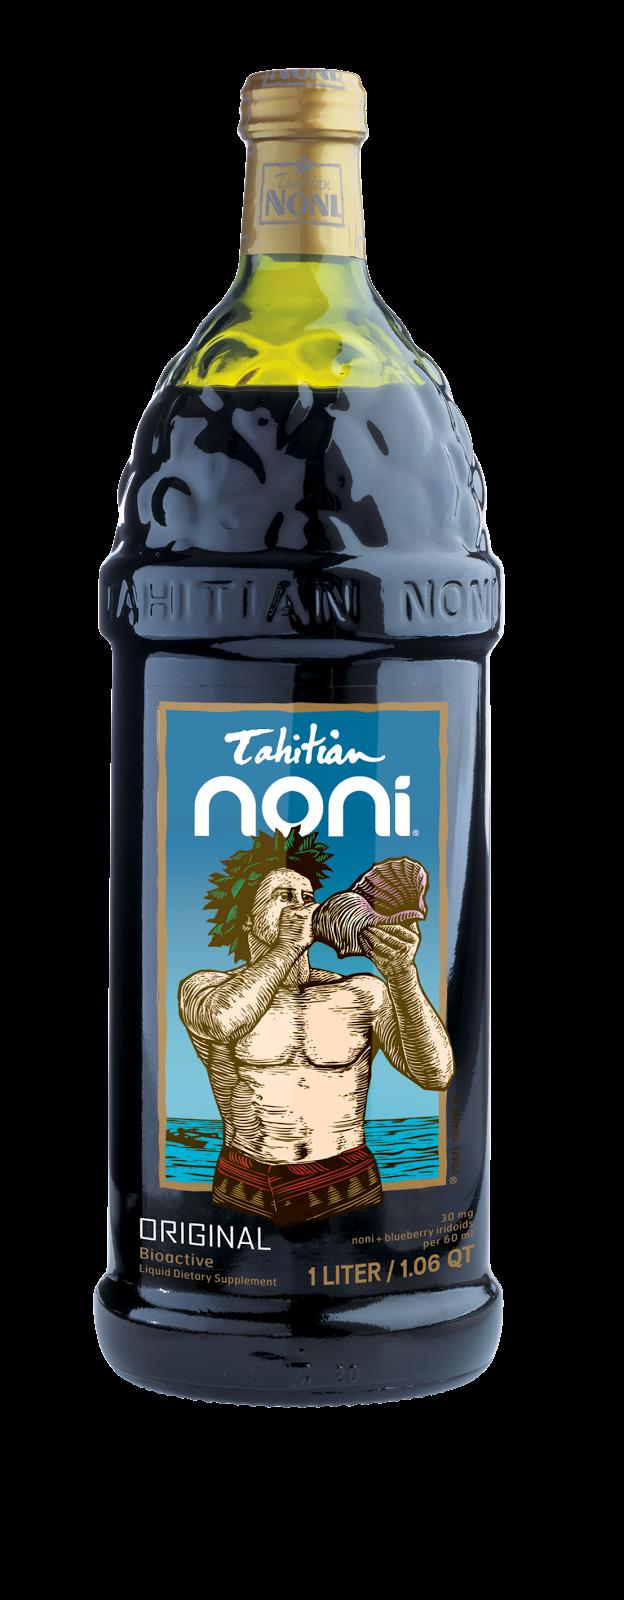 Ph. O813 2OOO 7764, Tahitian Noni Juice Bandung